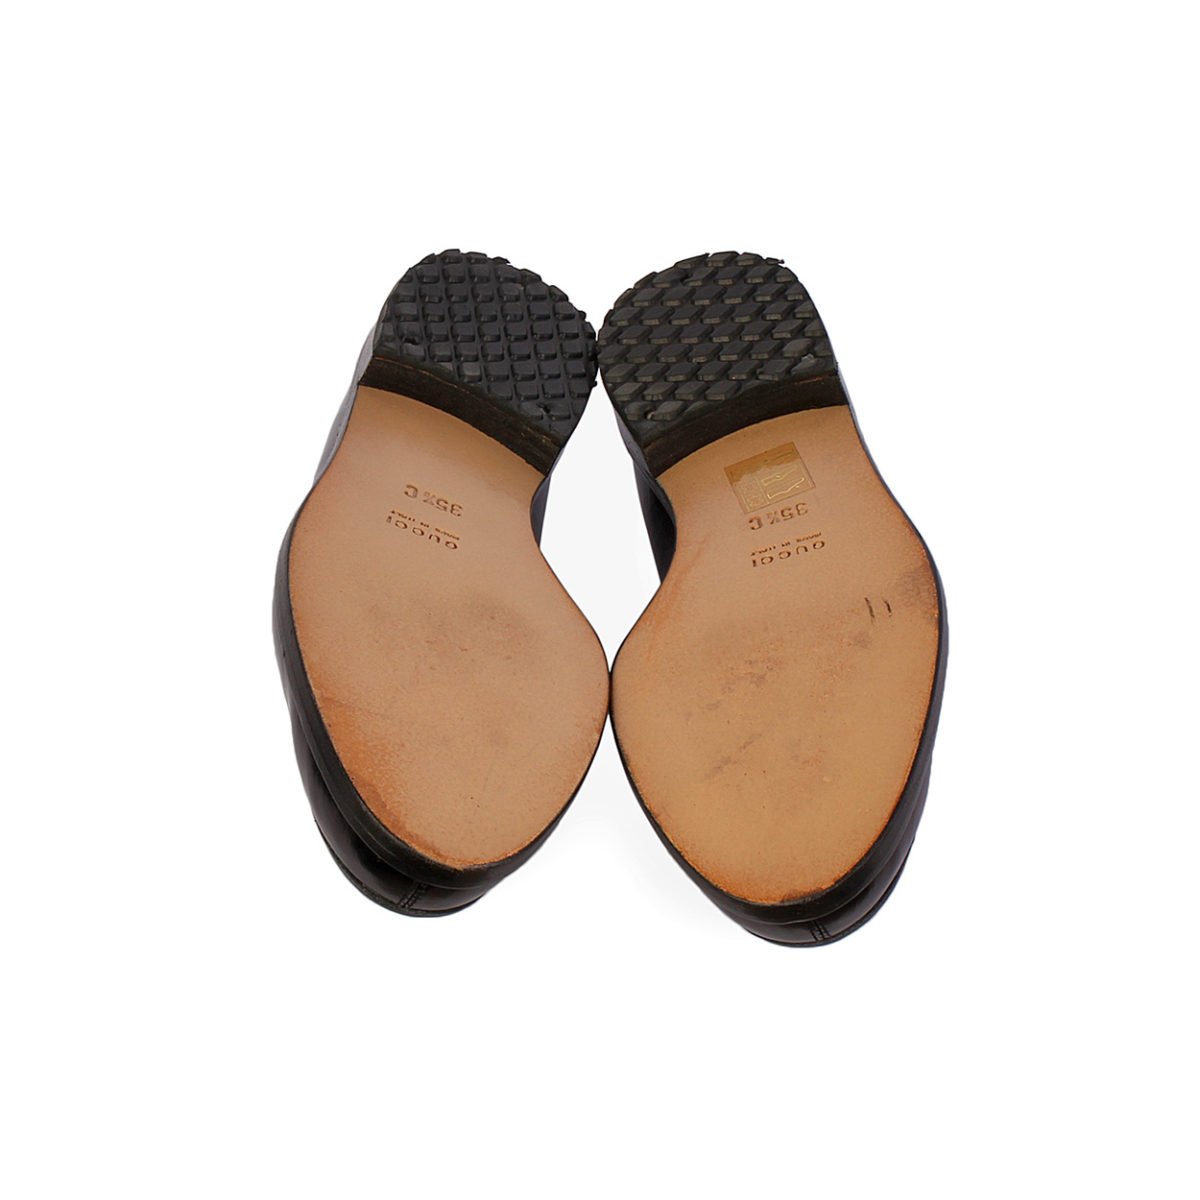 775ca5b6318 GUCCI Horsebit Leather Loafers Black – S  35.5 (2.5)